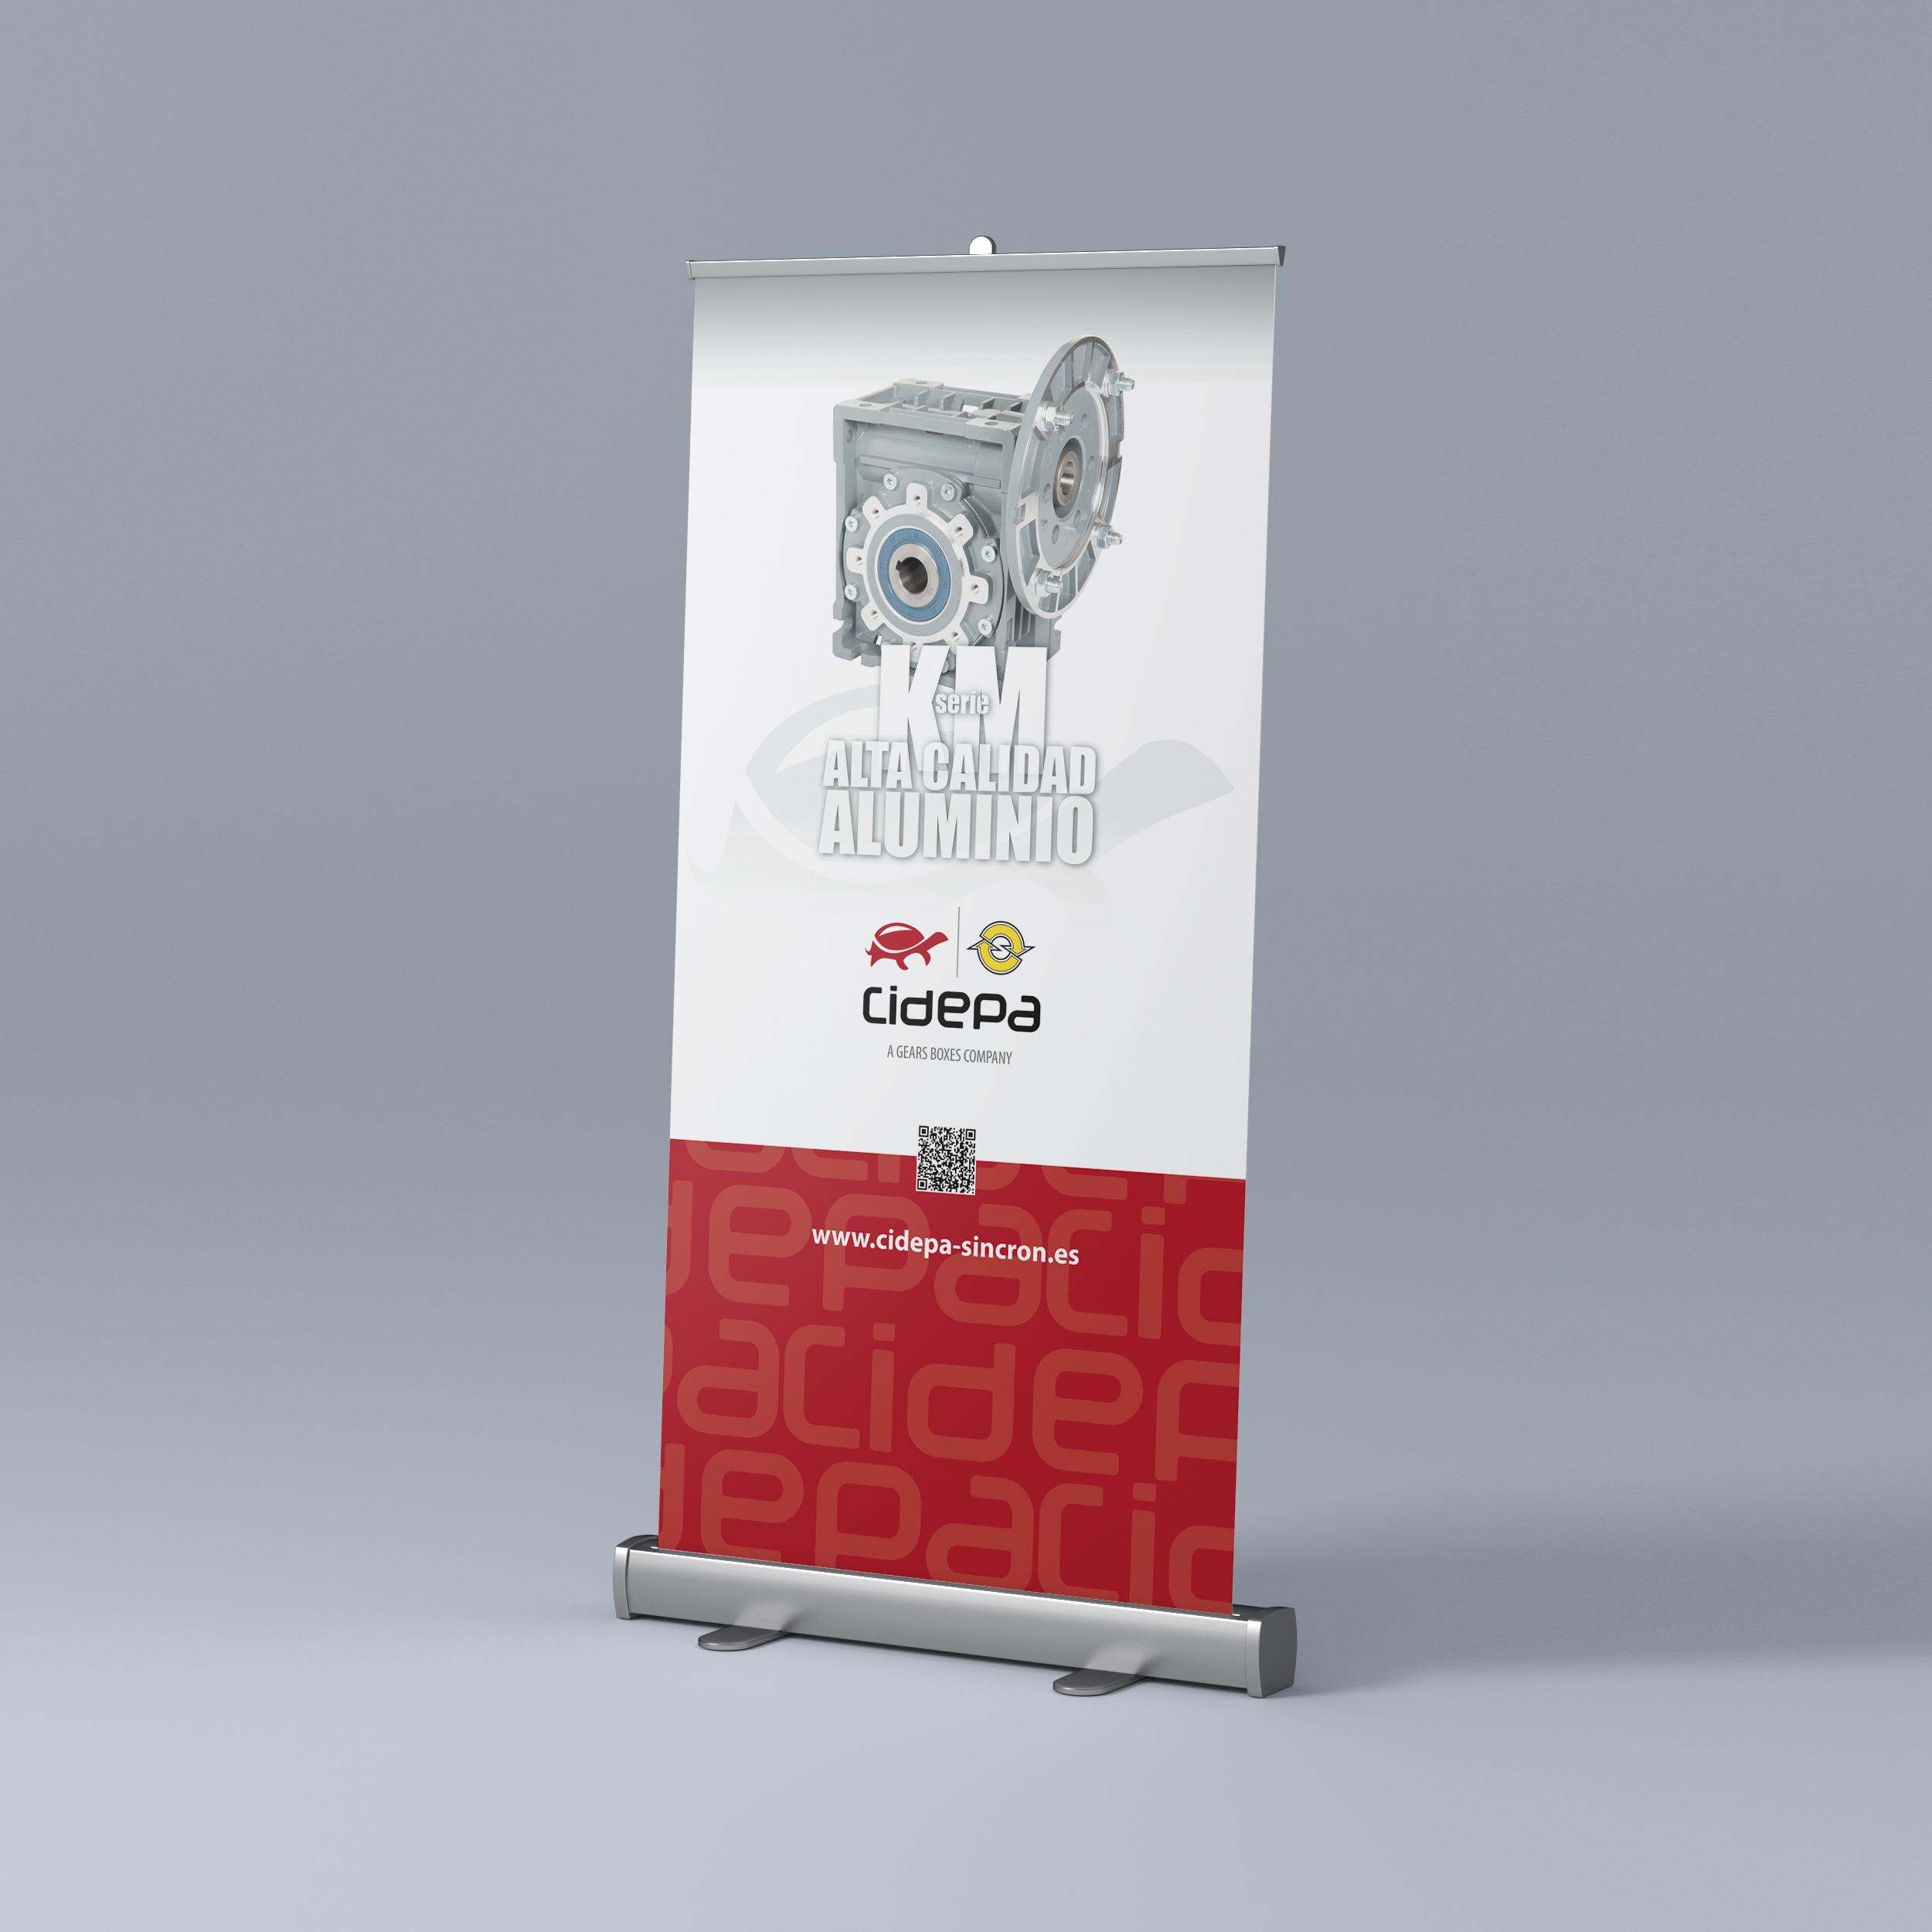 cidepa_branding_stand_expositor_textura_design